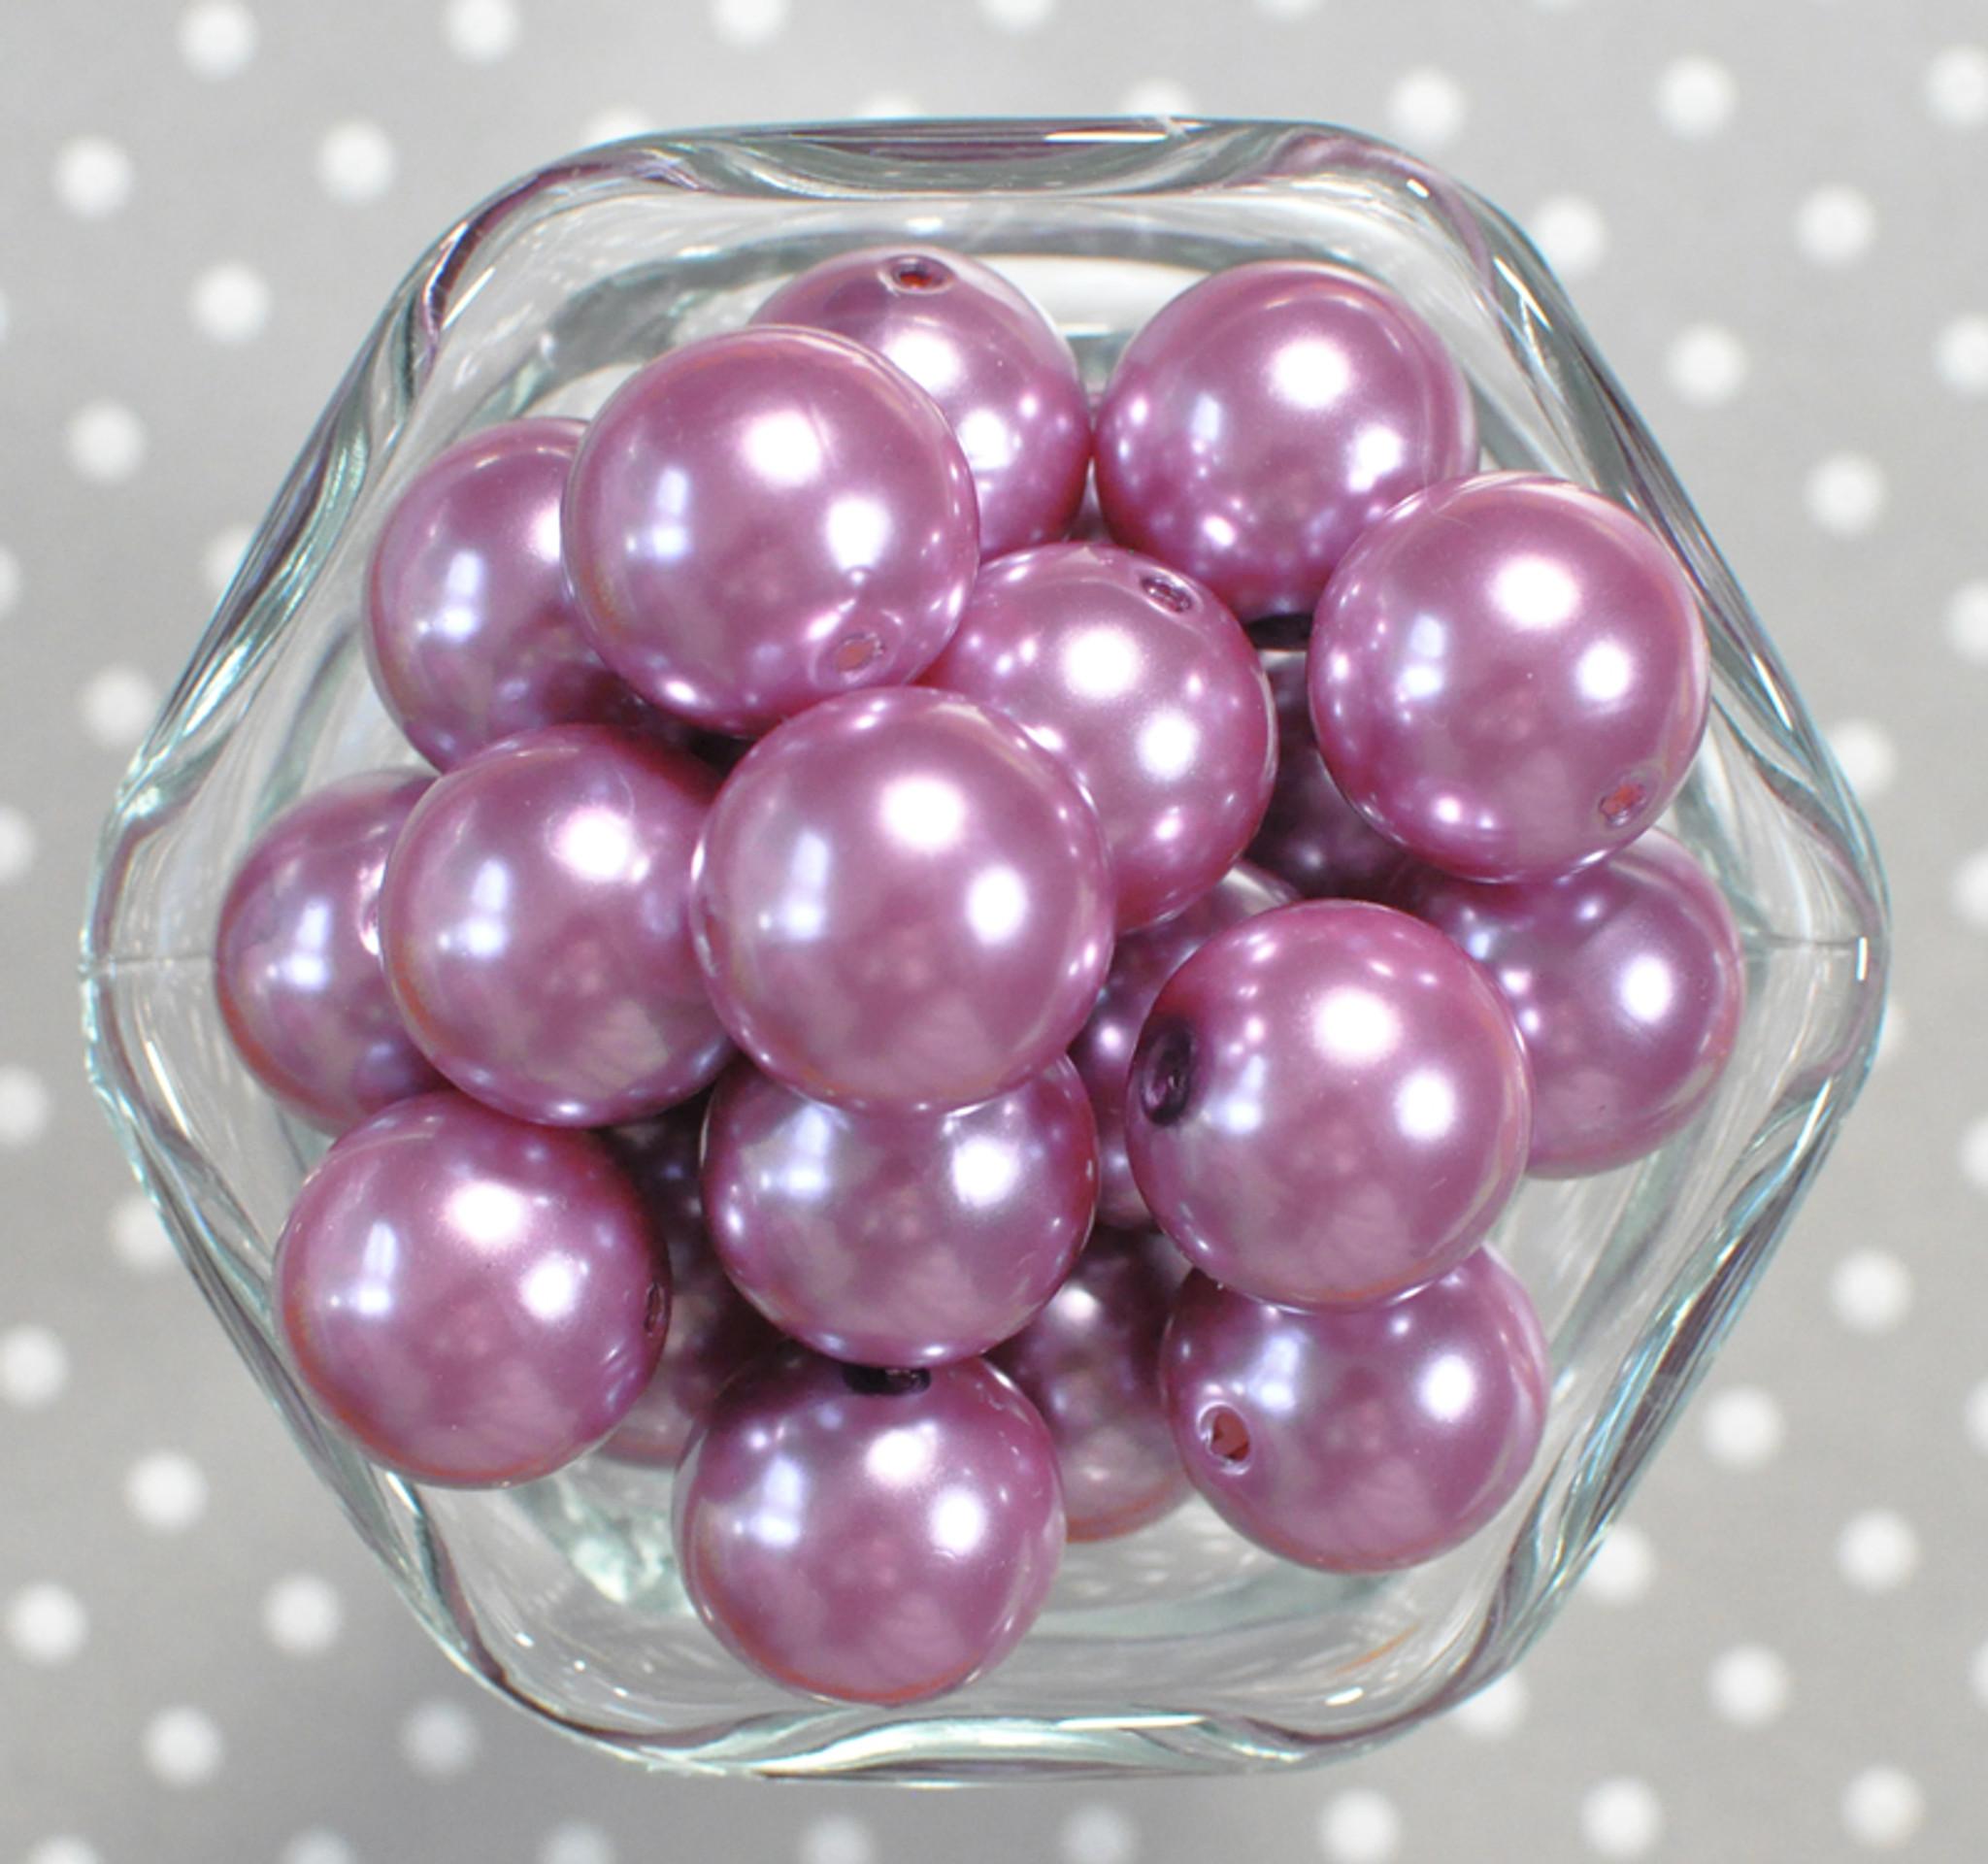 20mm Light Thistle purple pearl bubblegum beads